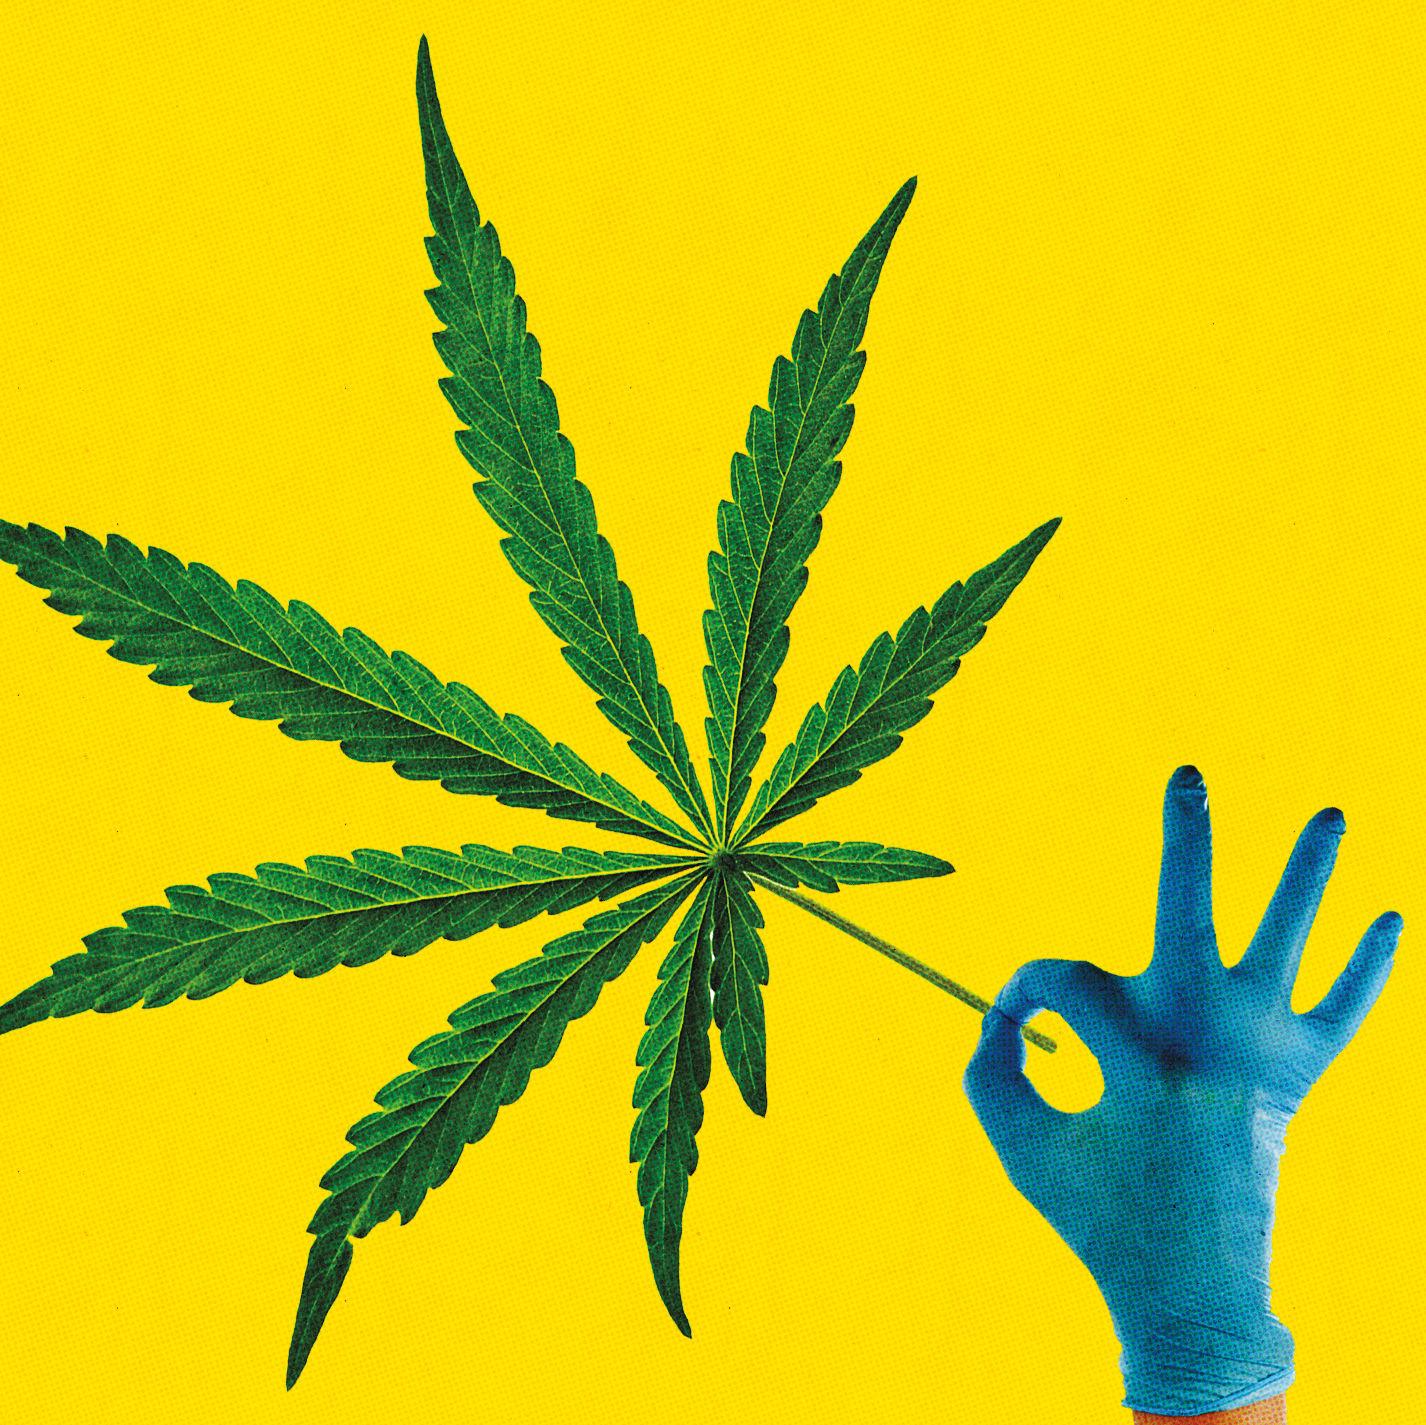 Pomo 0417 clackamas marijuana weed lsoffj